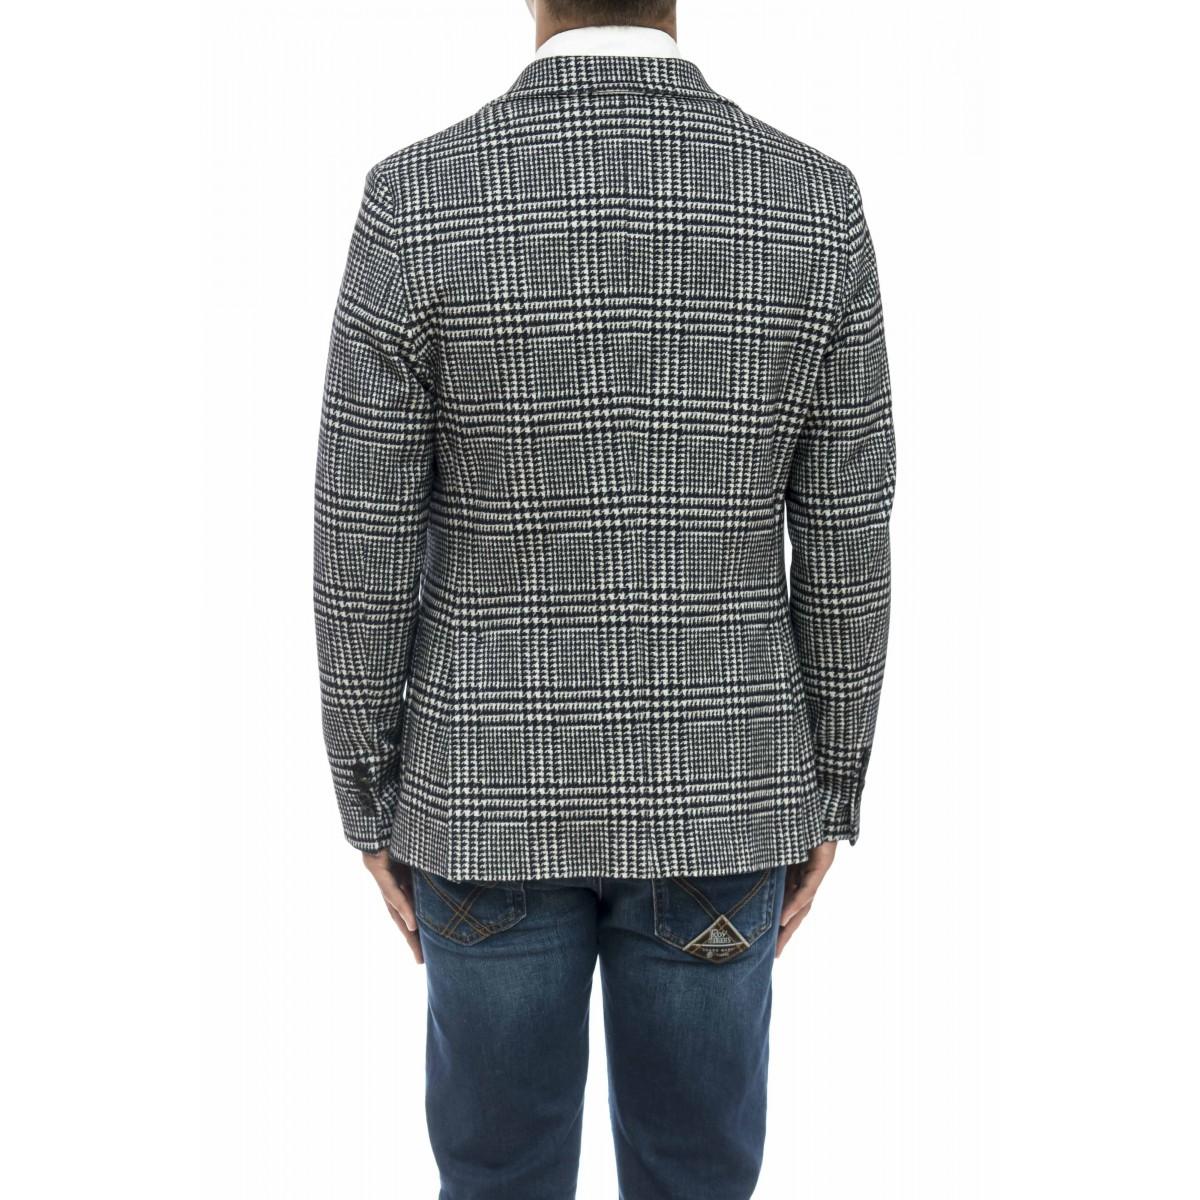 Giacca uomo - Cn2410 giacca pie di pois jersey strech